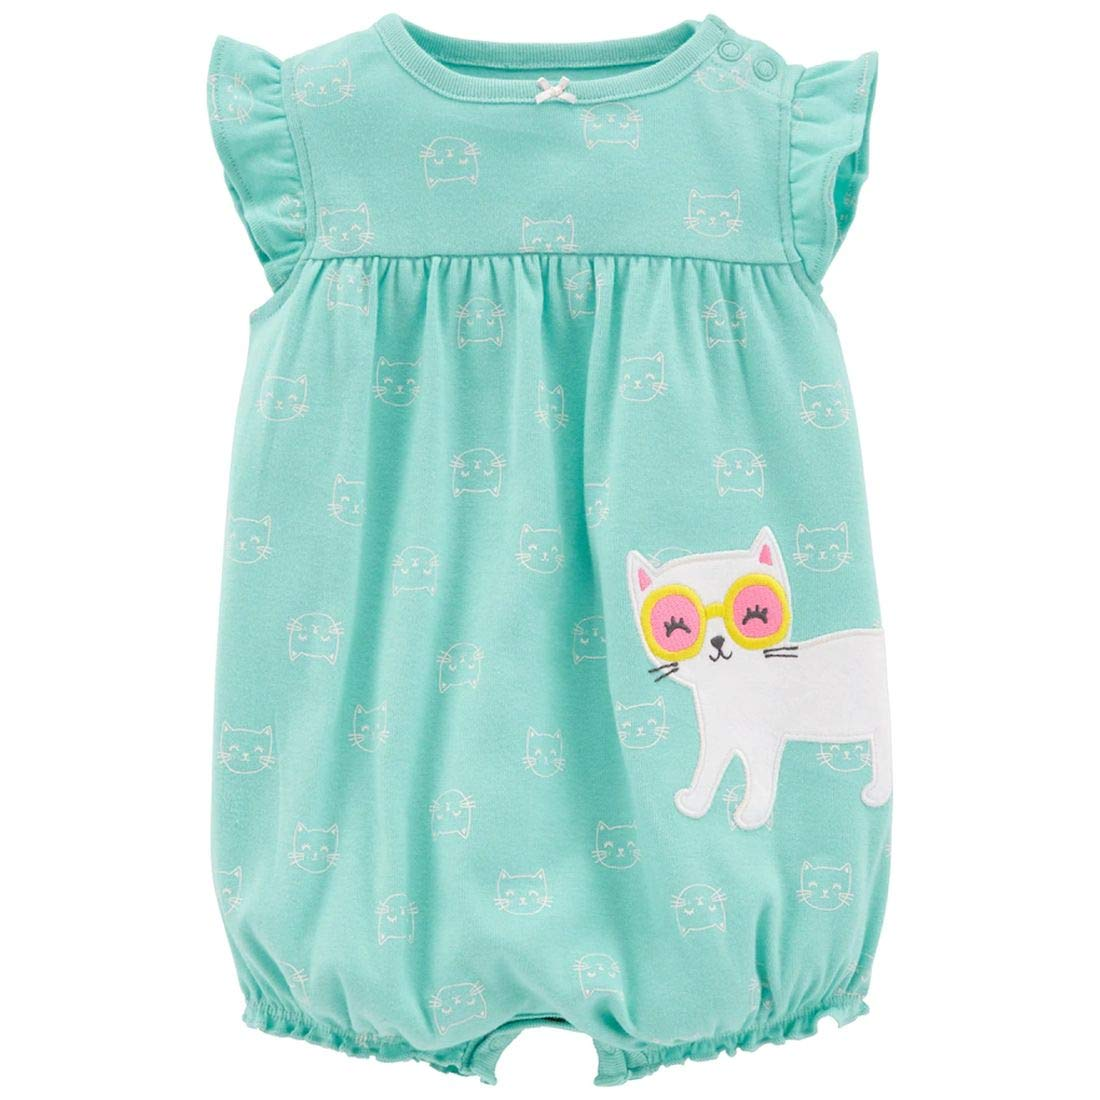 Carters Baby Girls One Piece Cat Romper